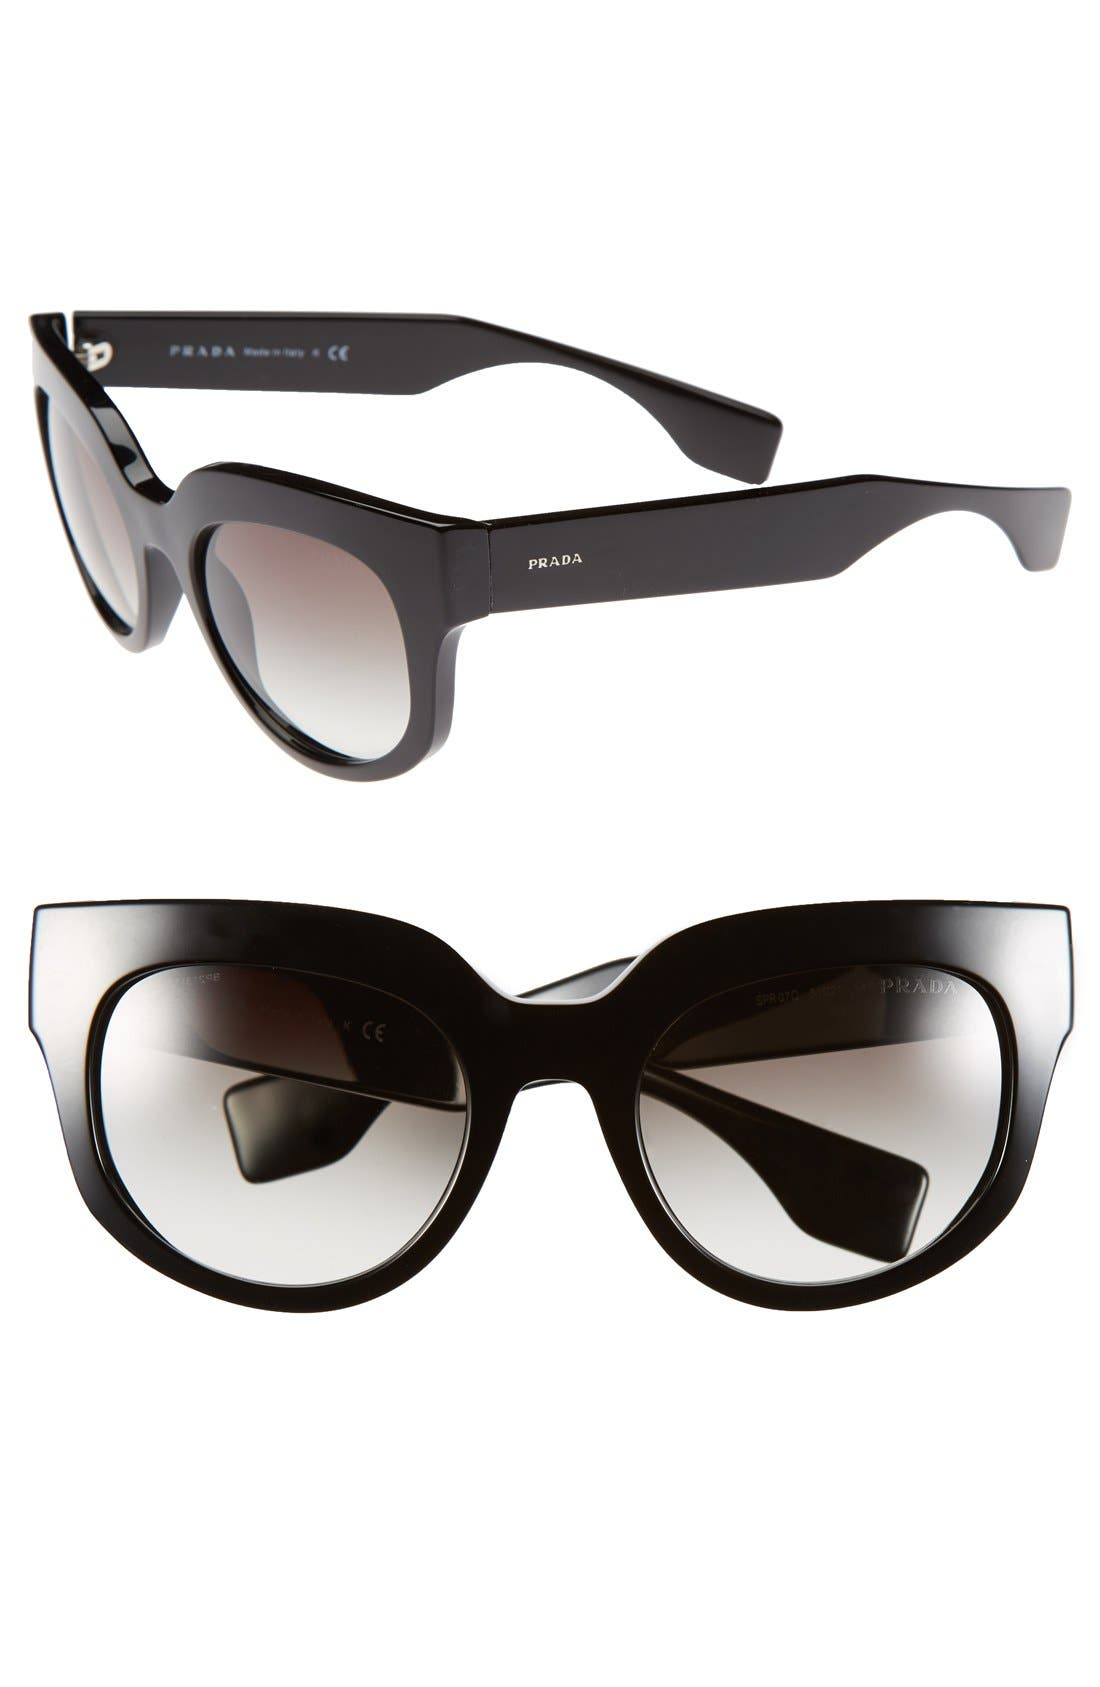 Main Image - Prada 52mm Sunglasses